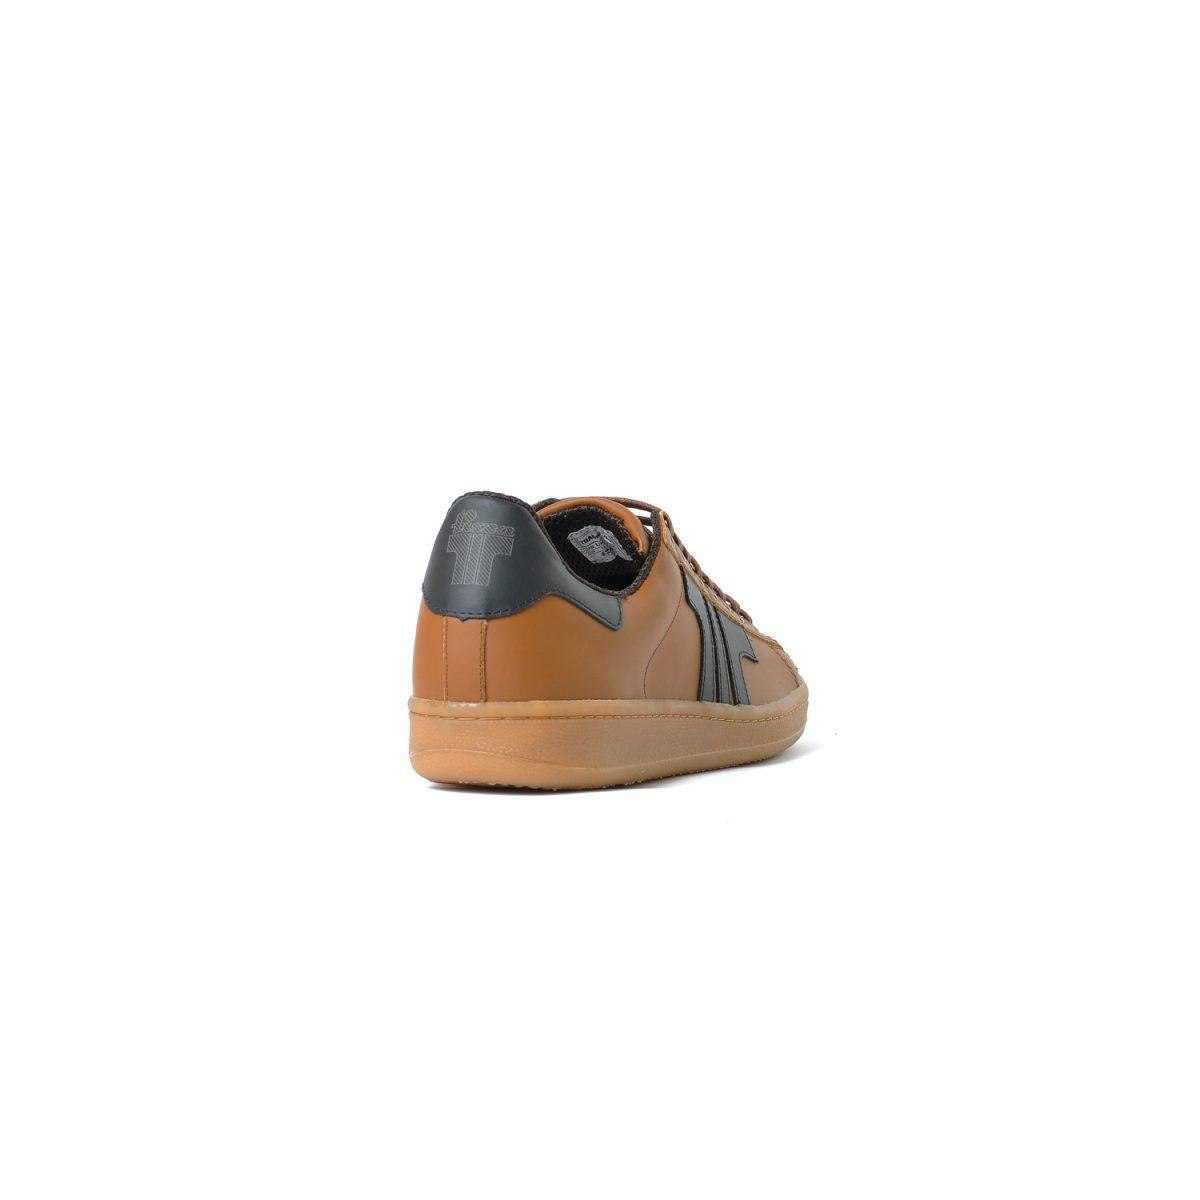 Tisza cipő - Tradíció'80 - Bronzbrown-black